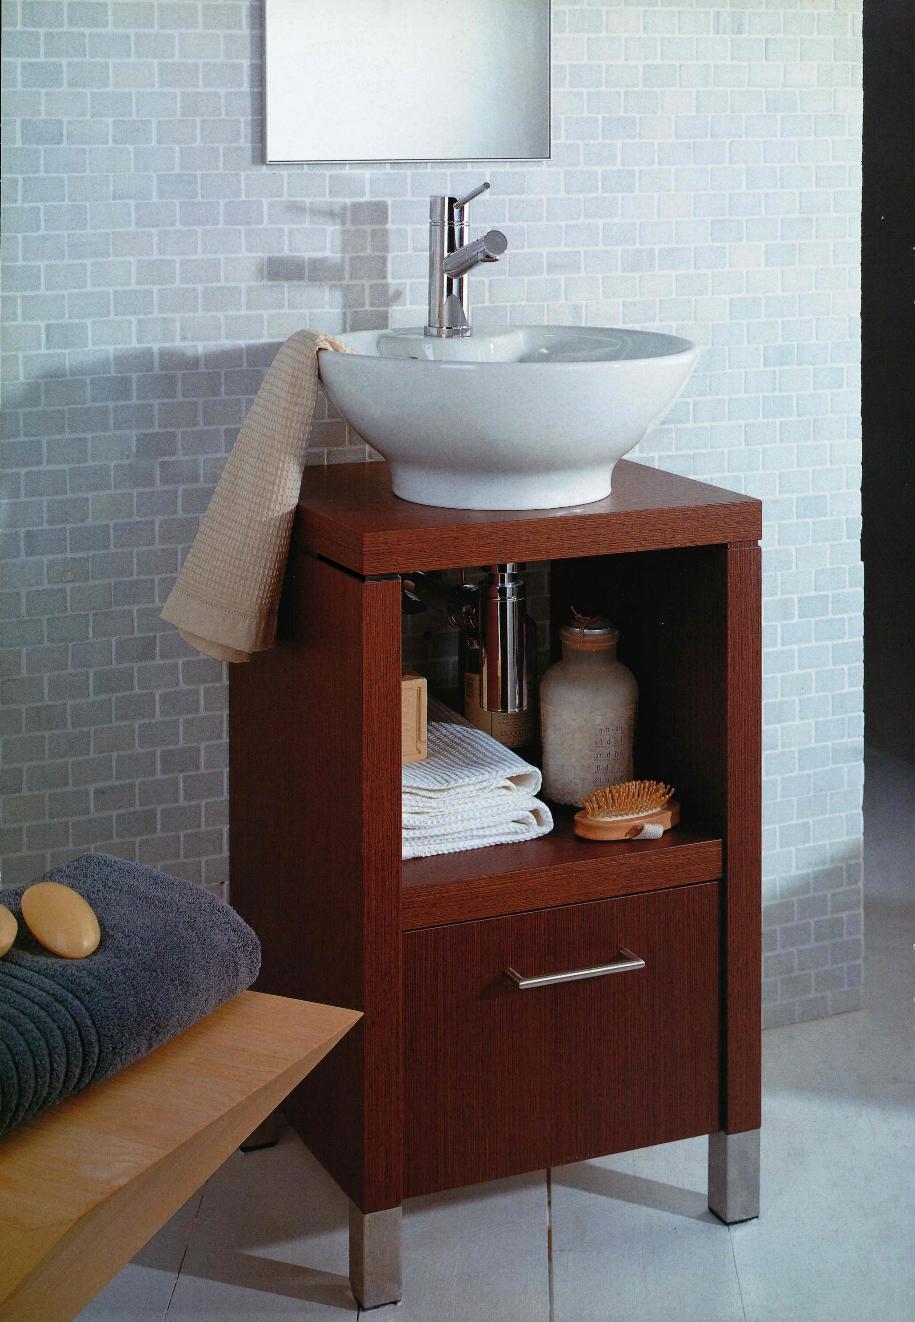 Contemporary style vanities modern bathroom vanity - Contemporary bathroom sinks and vanities ...